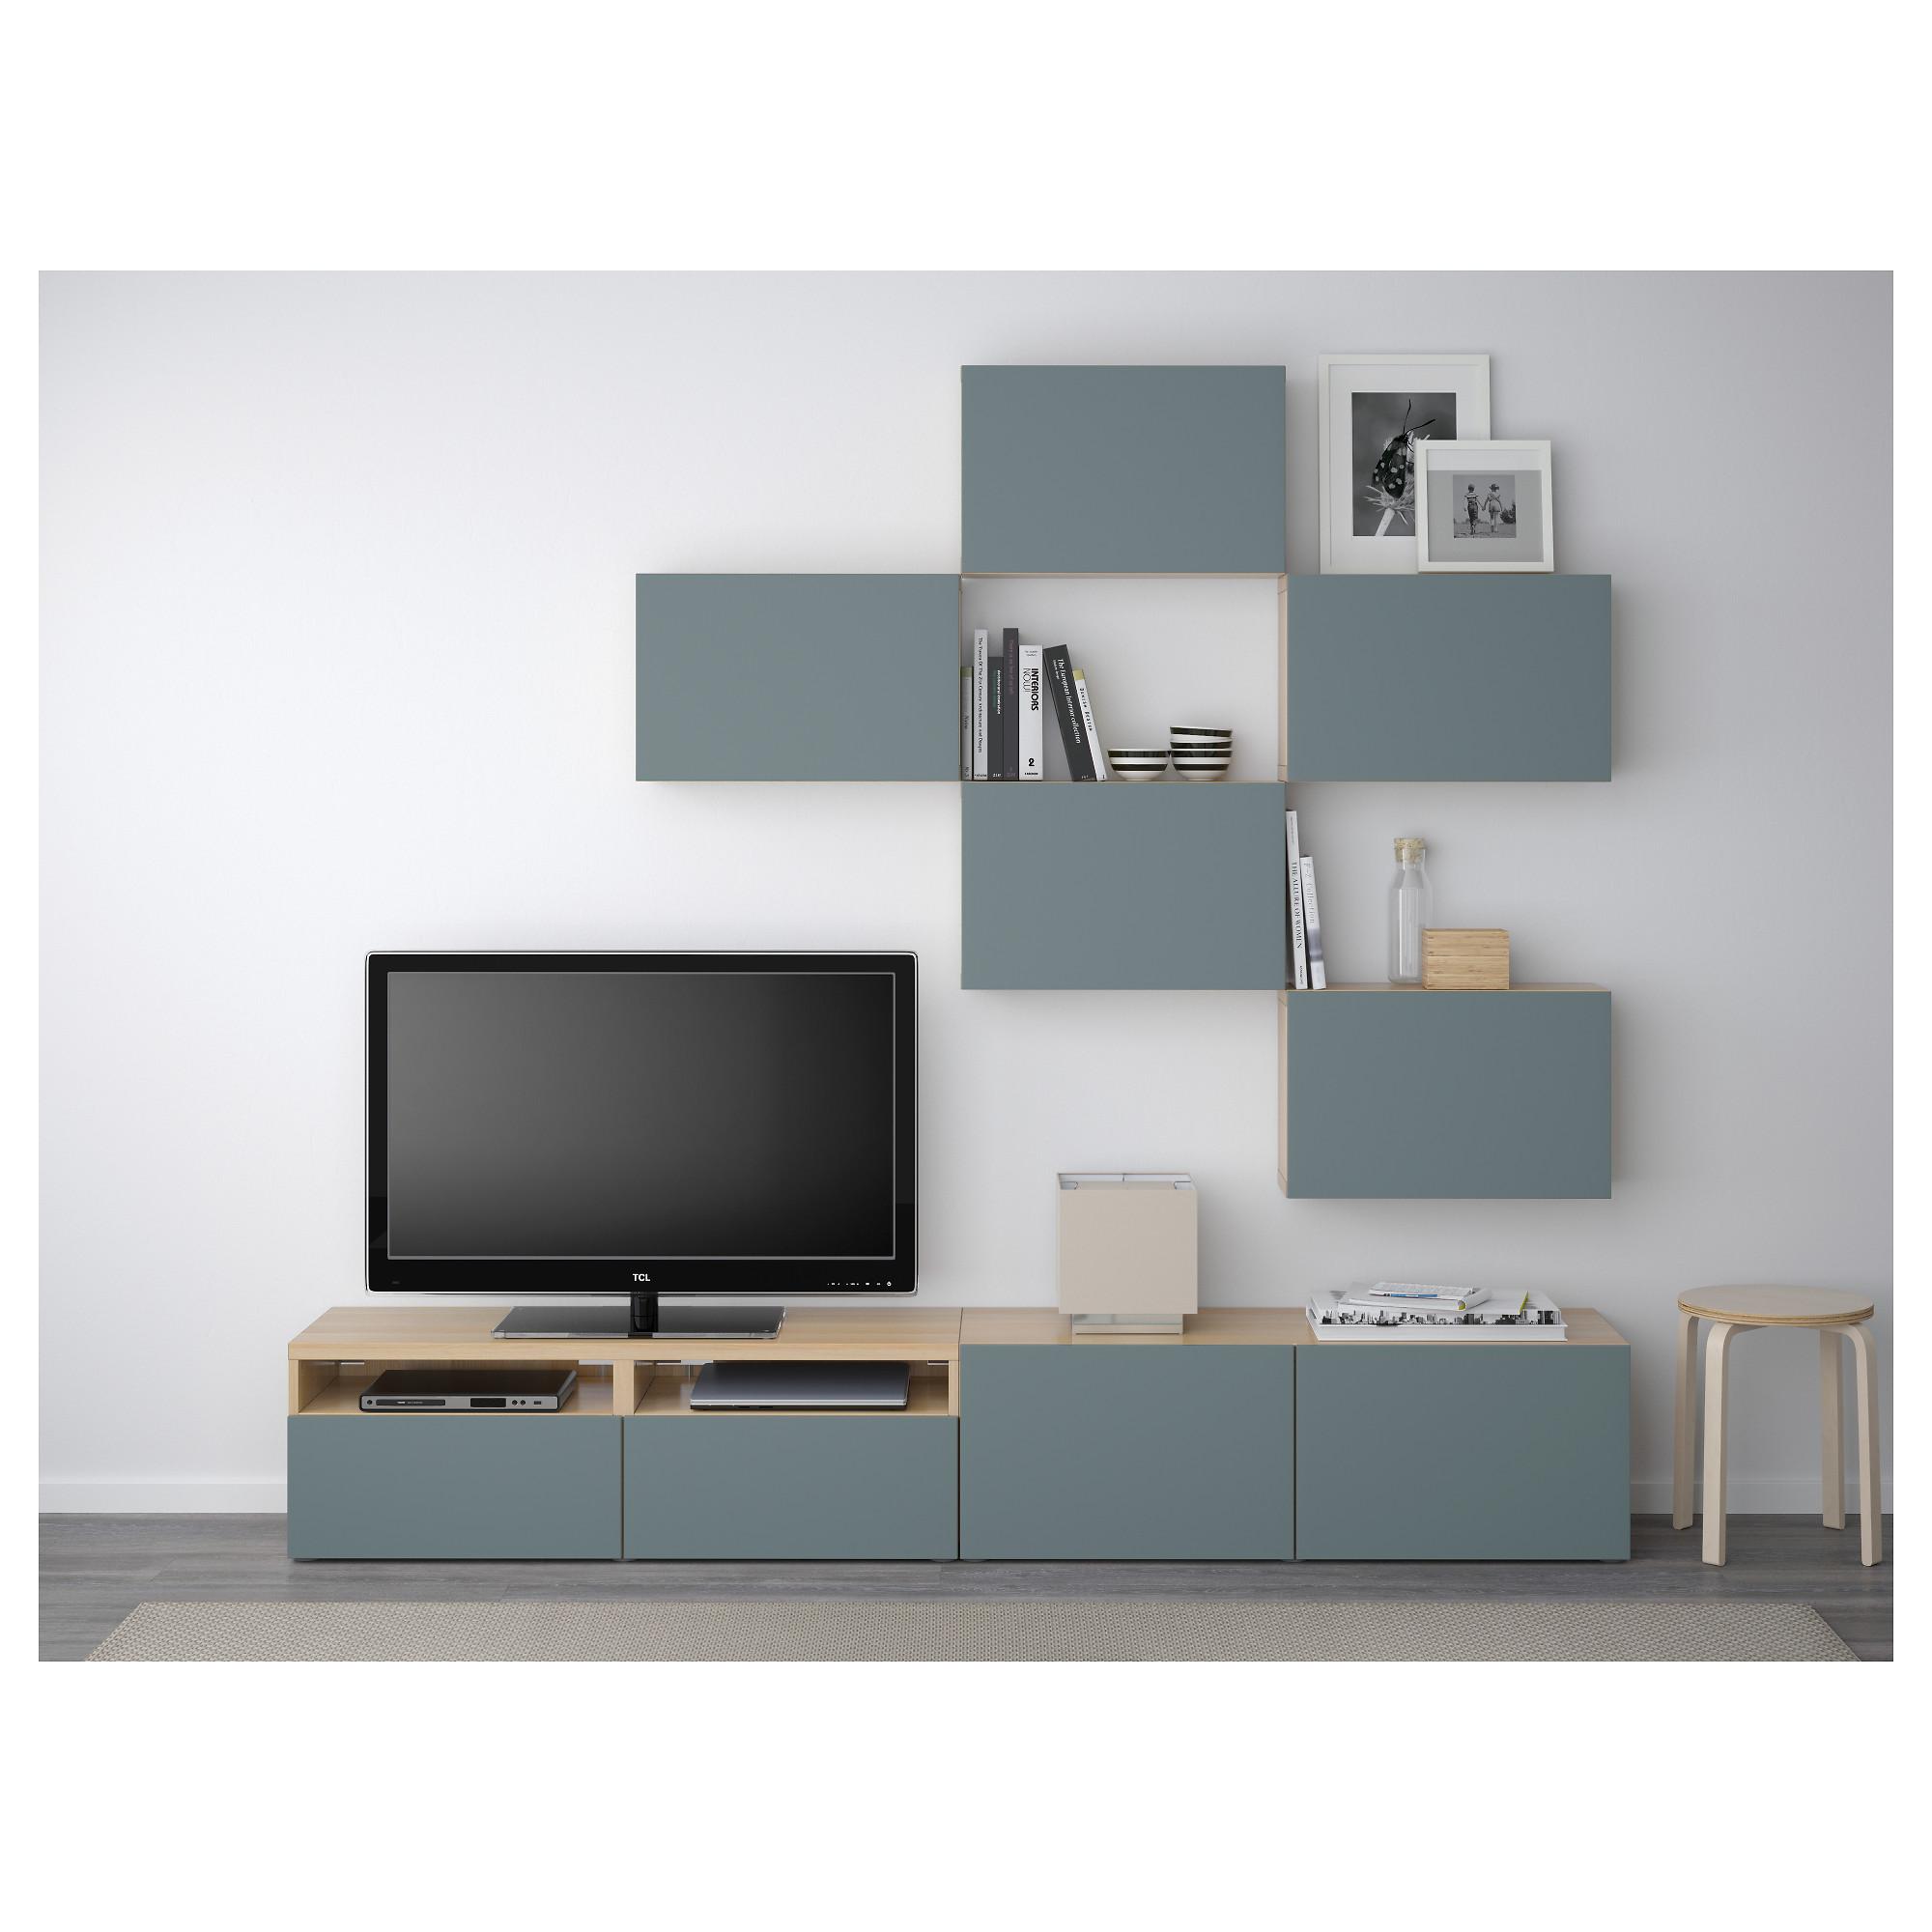 Шкаф для ТВ, комбинация БЕСТО артикуль № 592.516.71 в наличии. Онлайн сайт IKEA РБ. Быстрая доставка и установка.